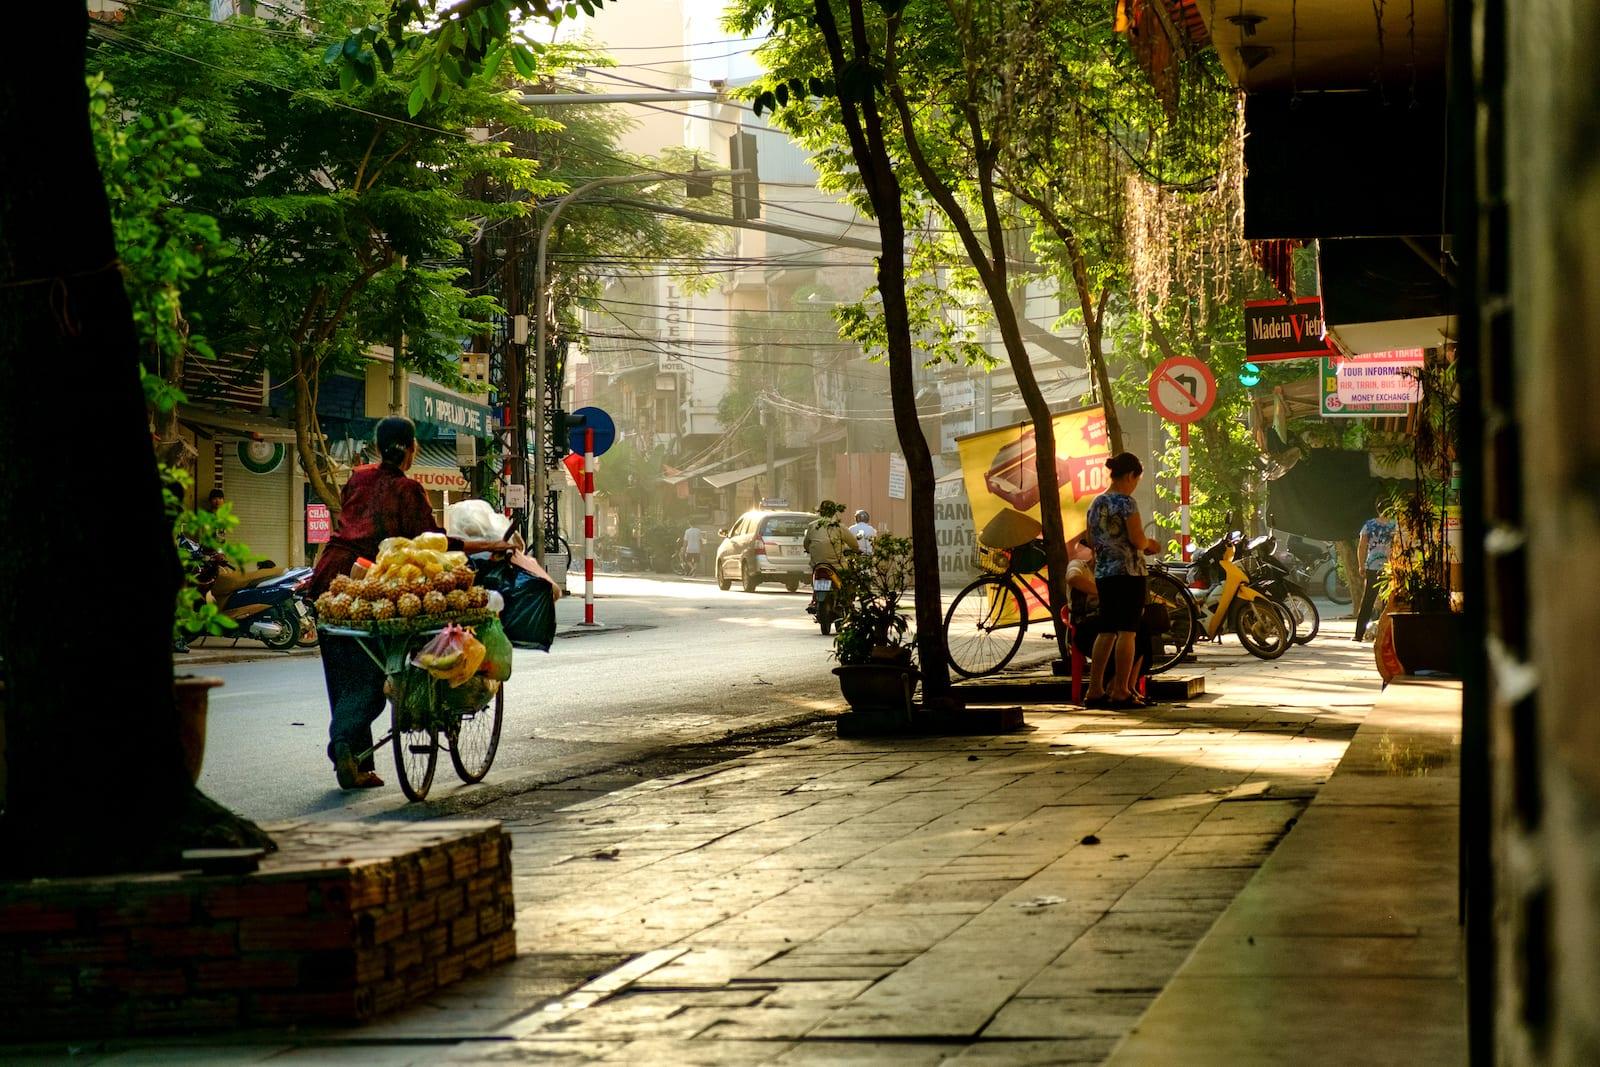 Fruit vendor making her rounds in July, Hanoi, Vietnam